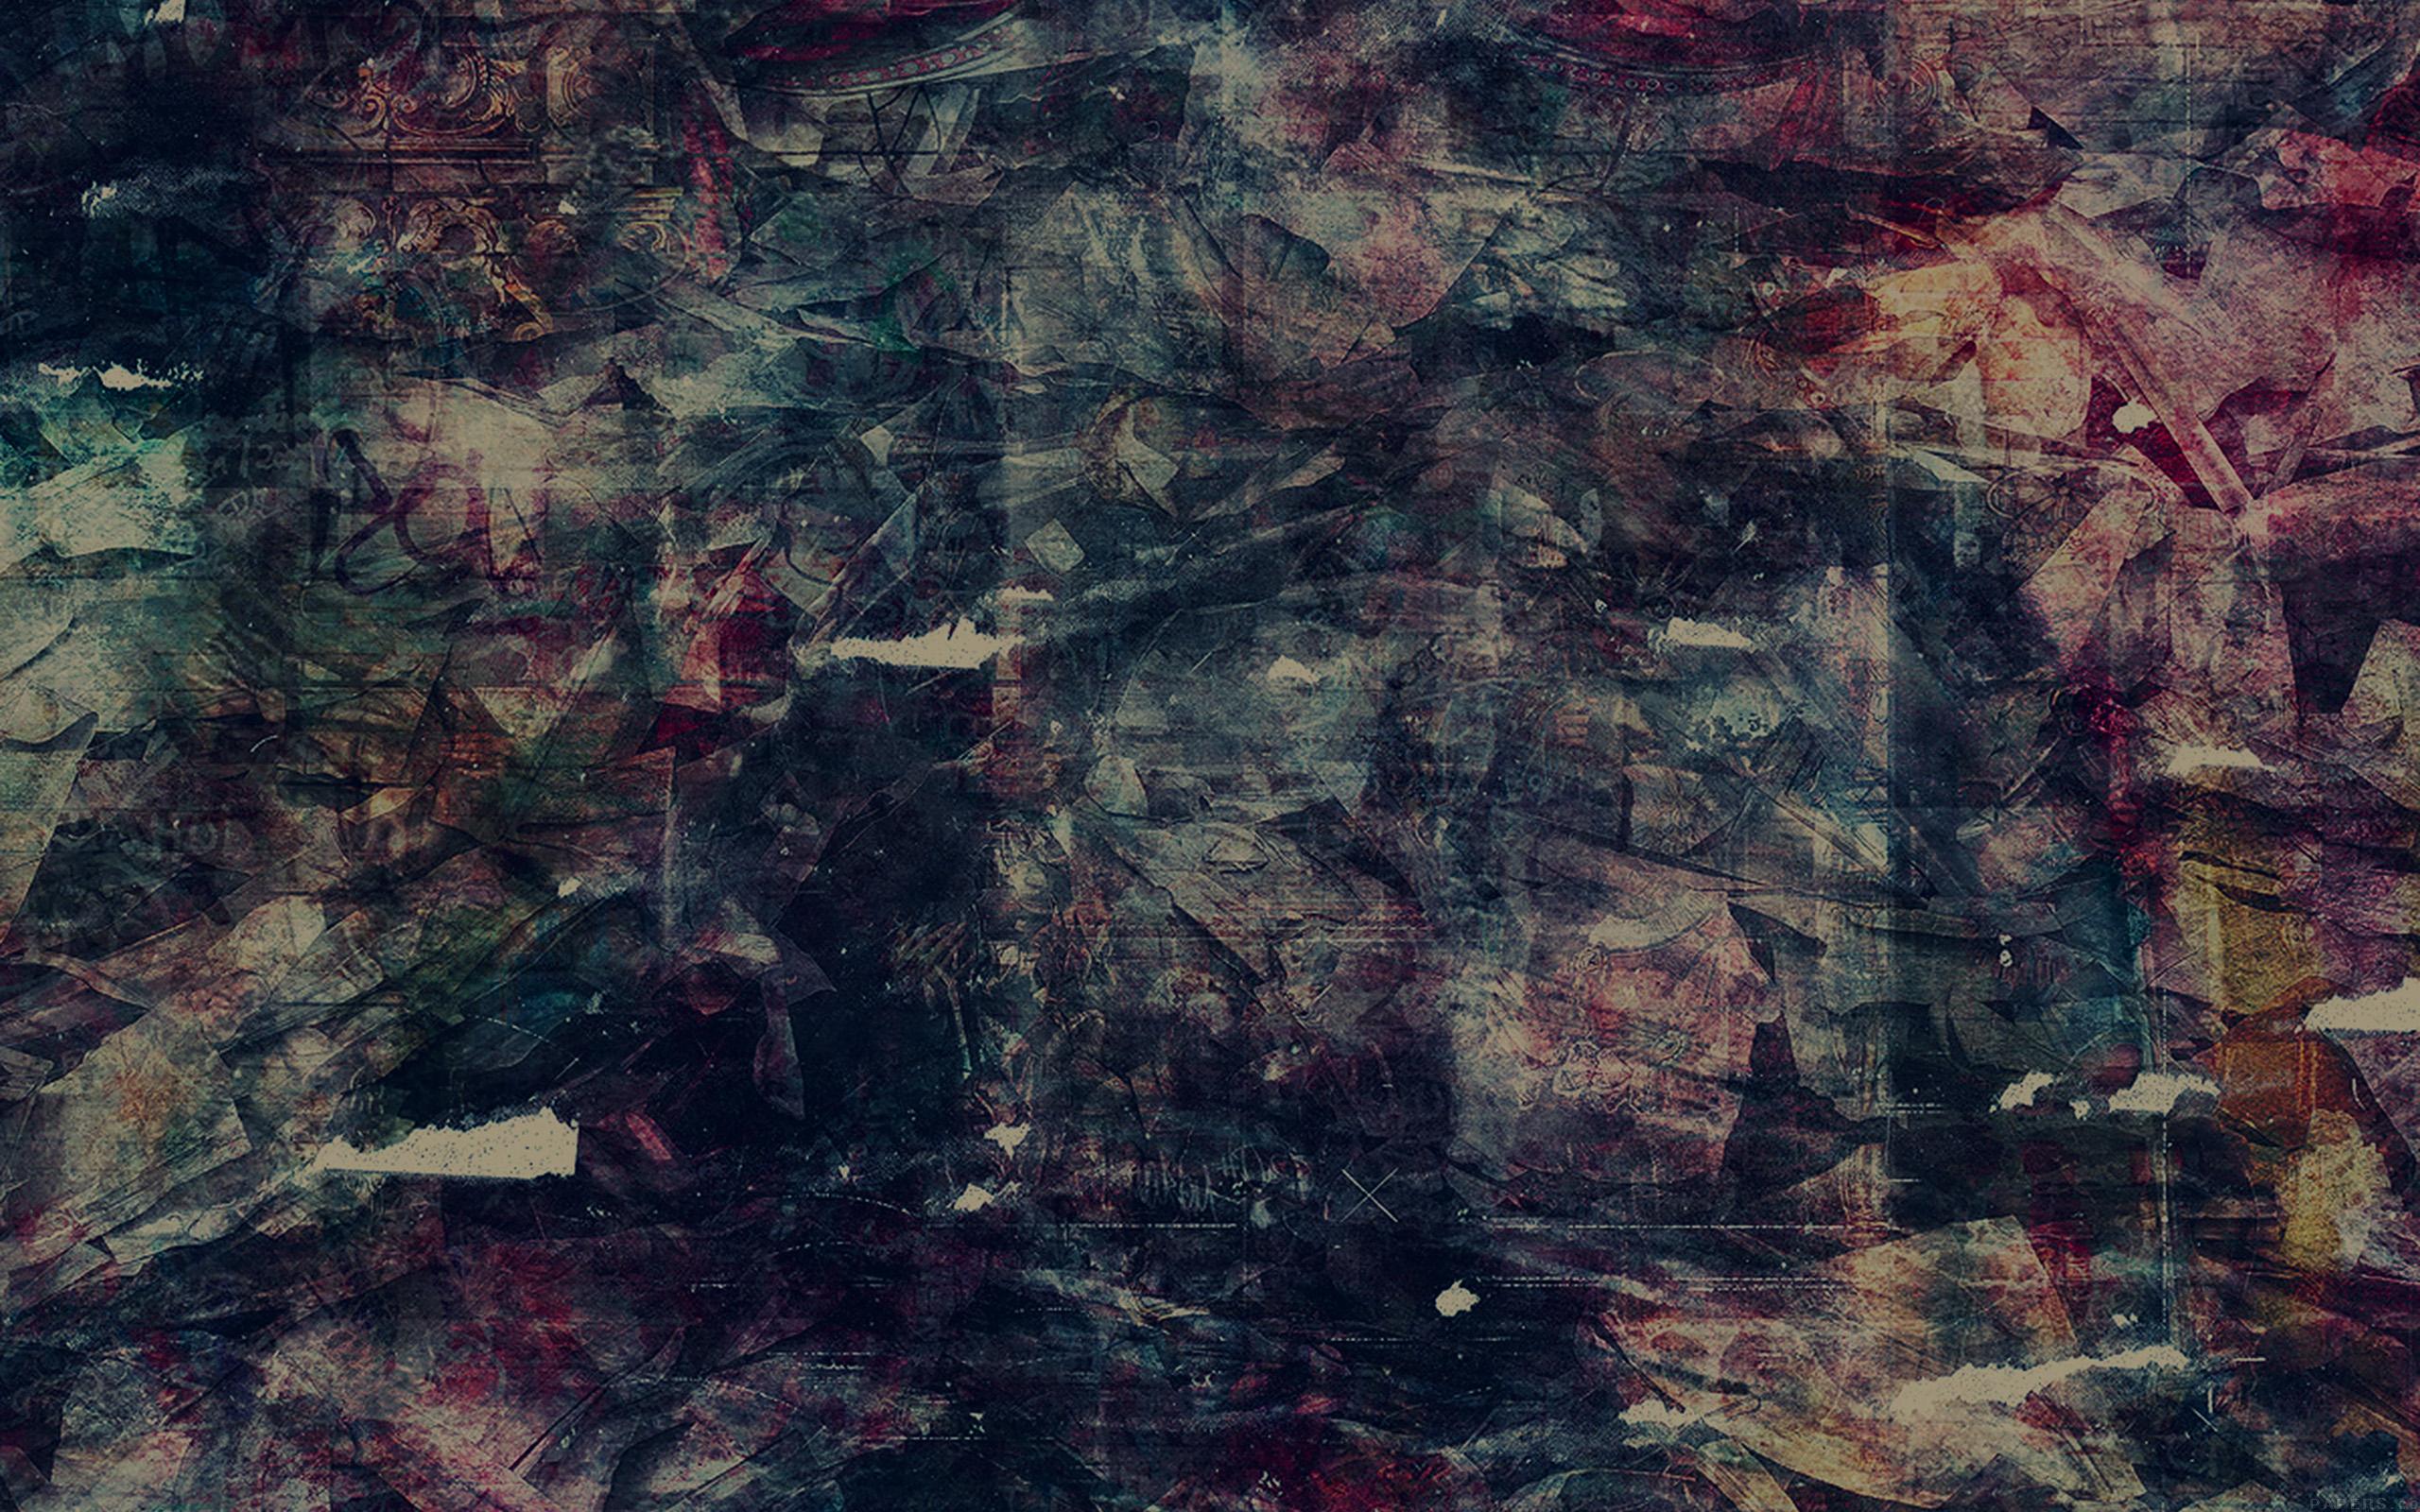 Iphone Wave Wallpaper Al31 Wonder Lust Art Illust Grunge Abstract Dark Papers Co